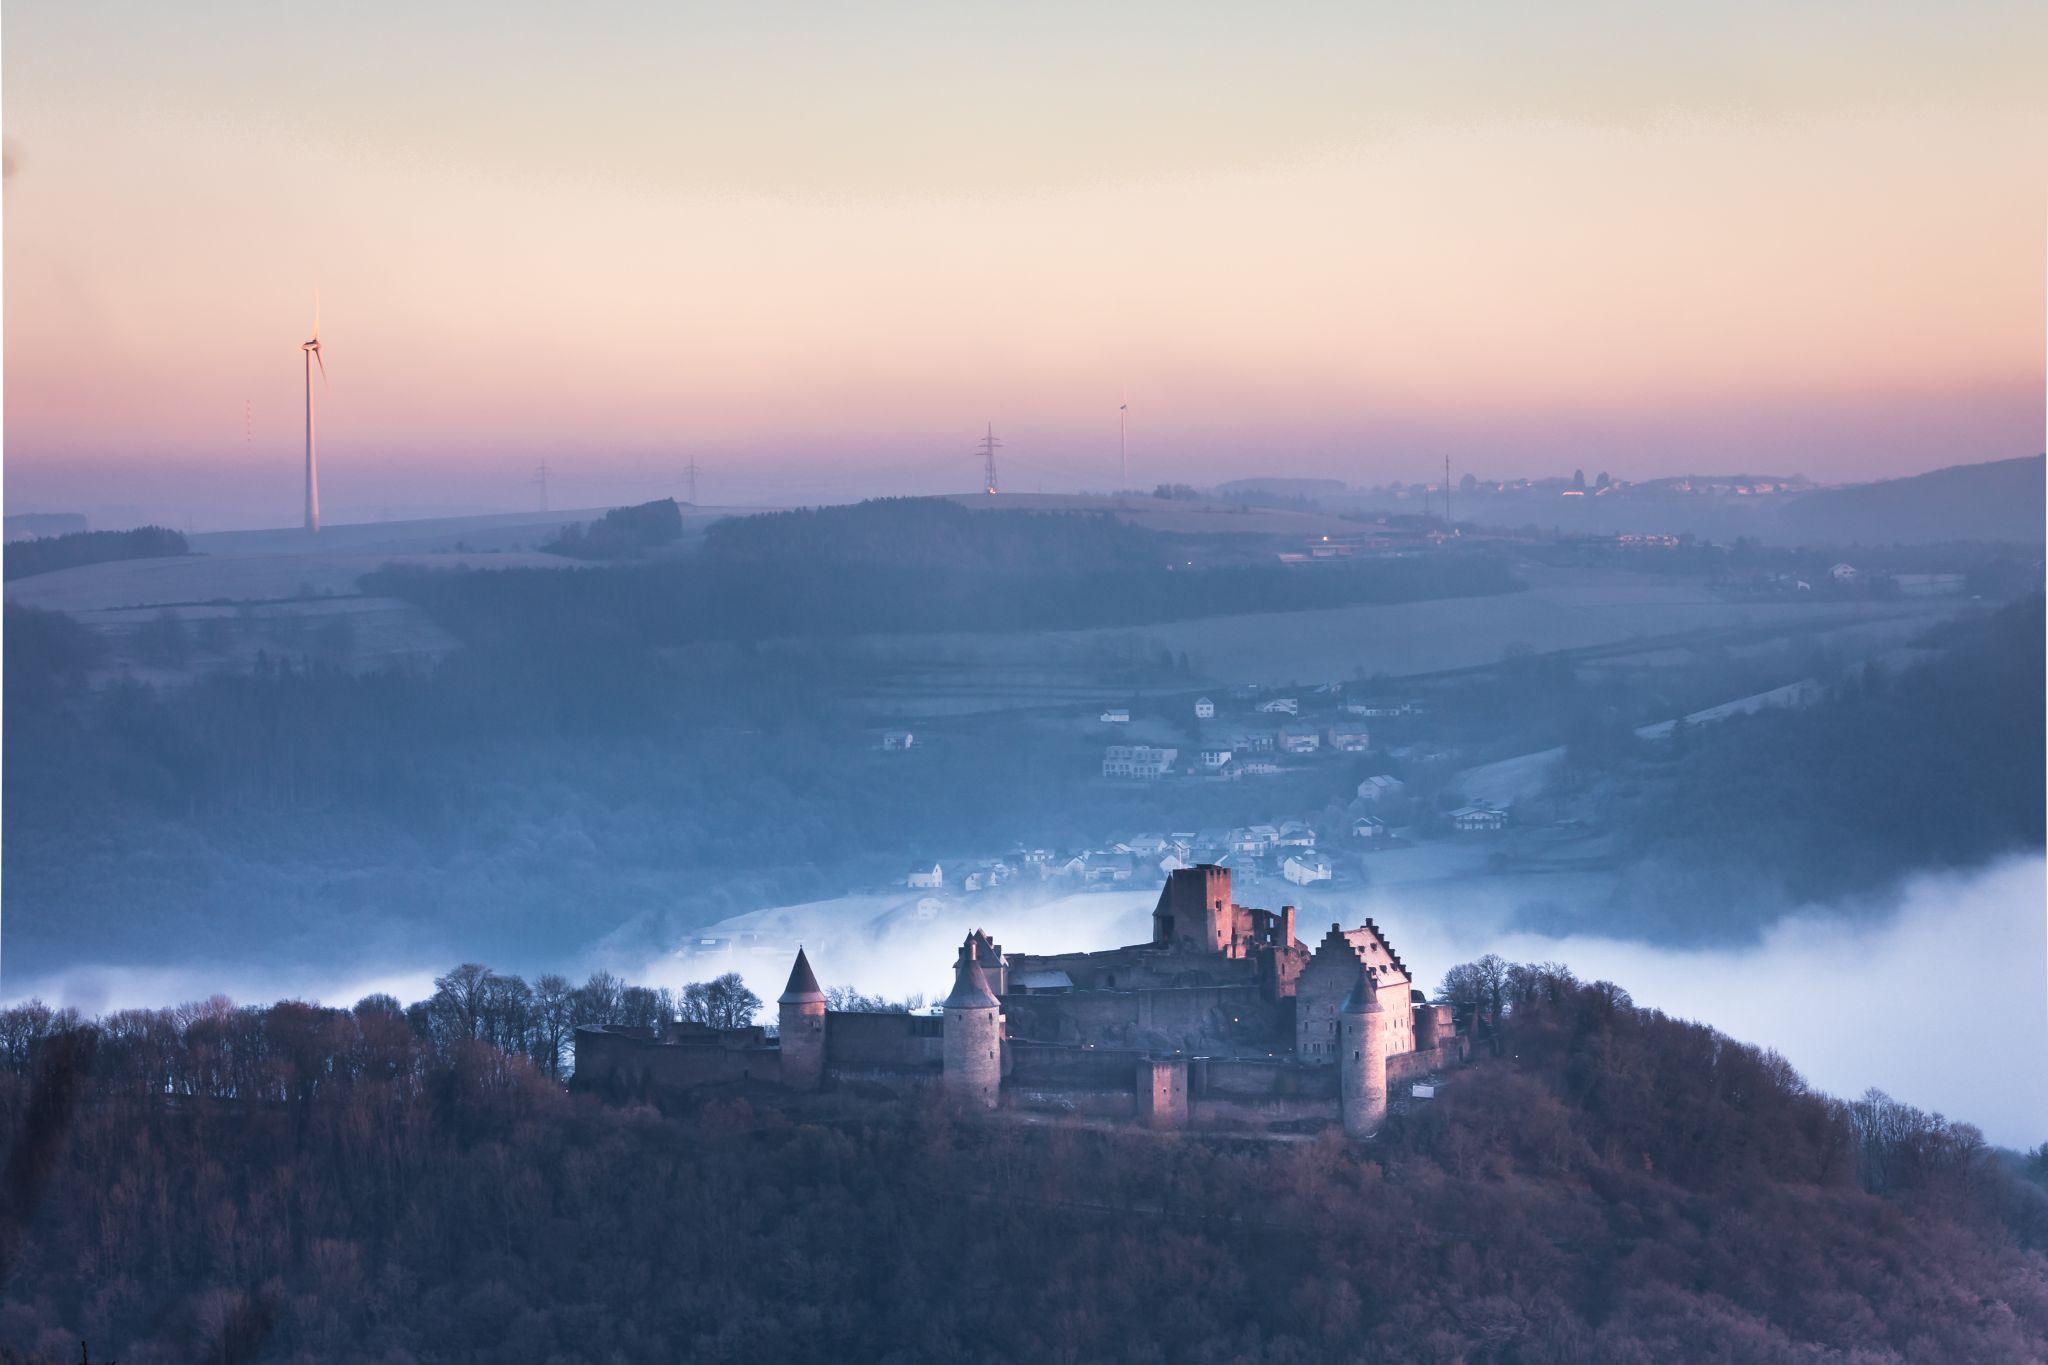 Bourscheid Château, Luxembourg